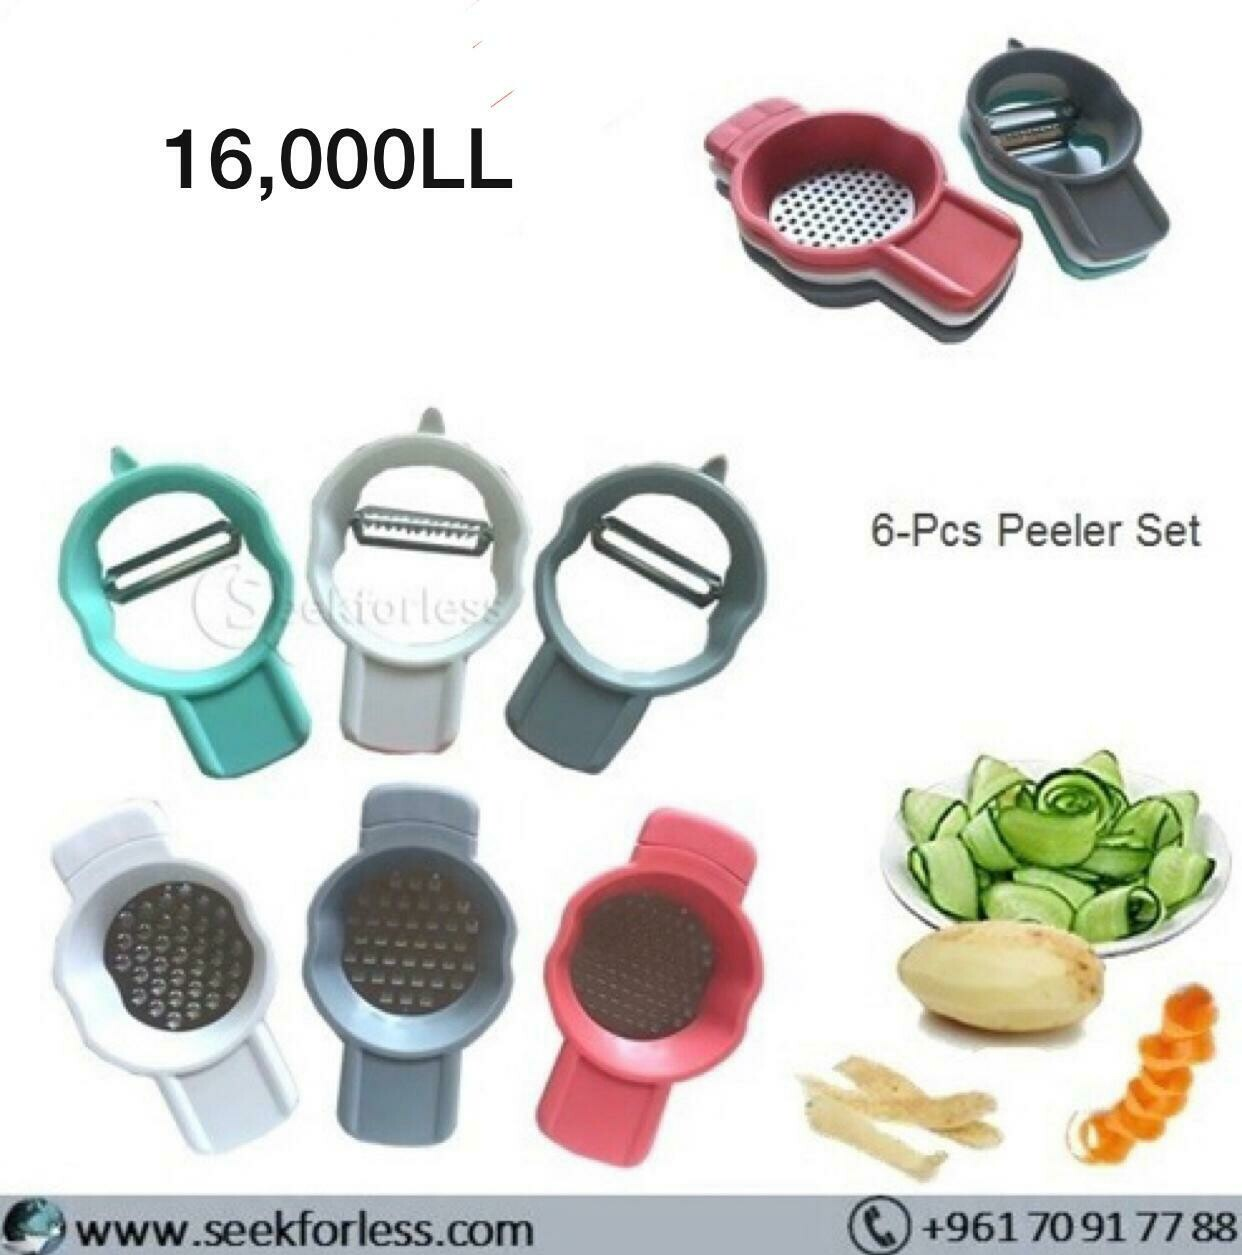 6-Pcs Peeler Set